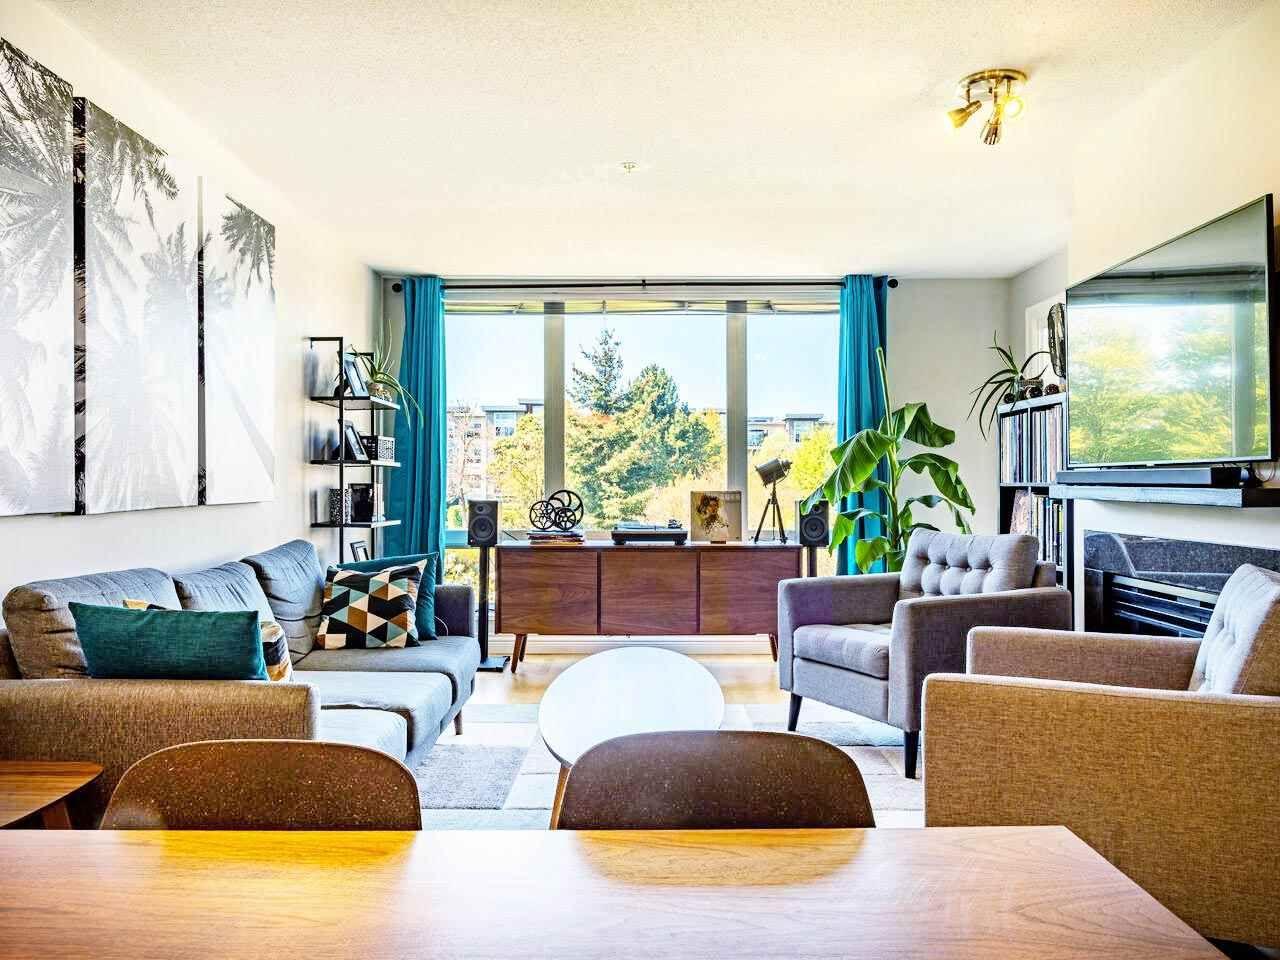 "Photo 2: Photos: 226 5800 ANDREWS Road in Richmond: Steveston South Condo for sale in ""THE VILLAS"" : MLS®# R2569641"